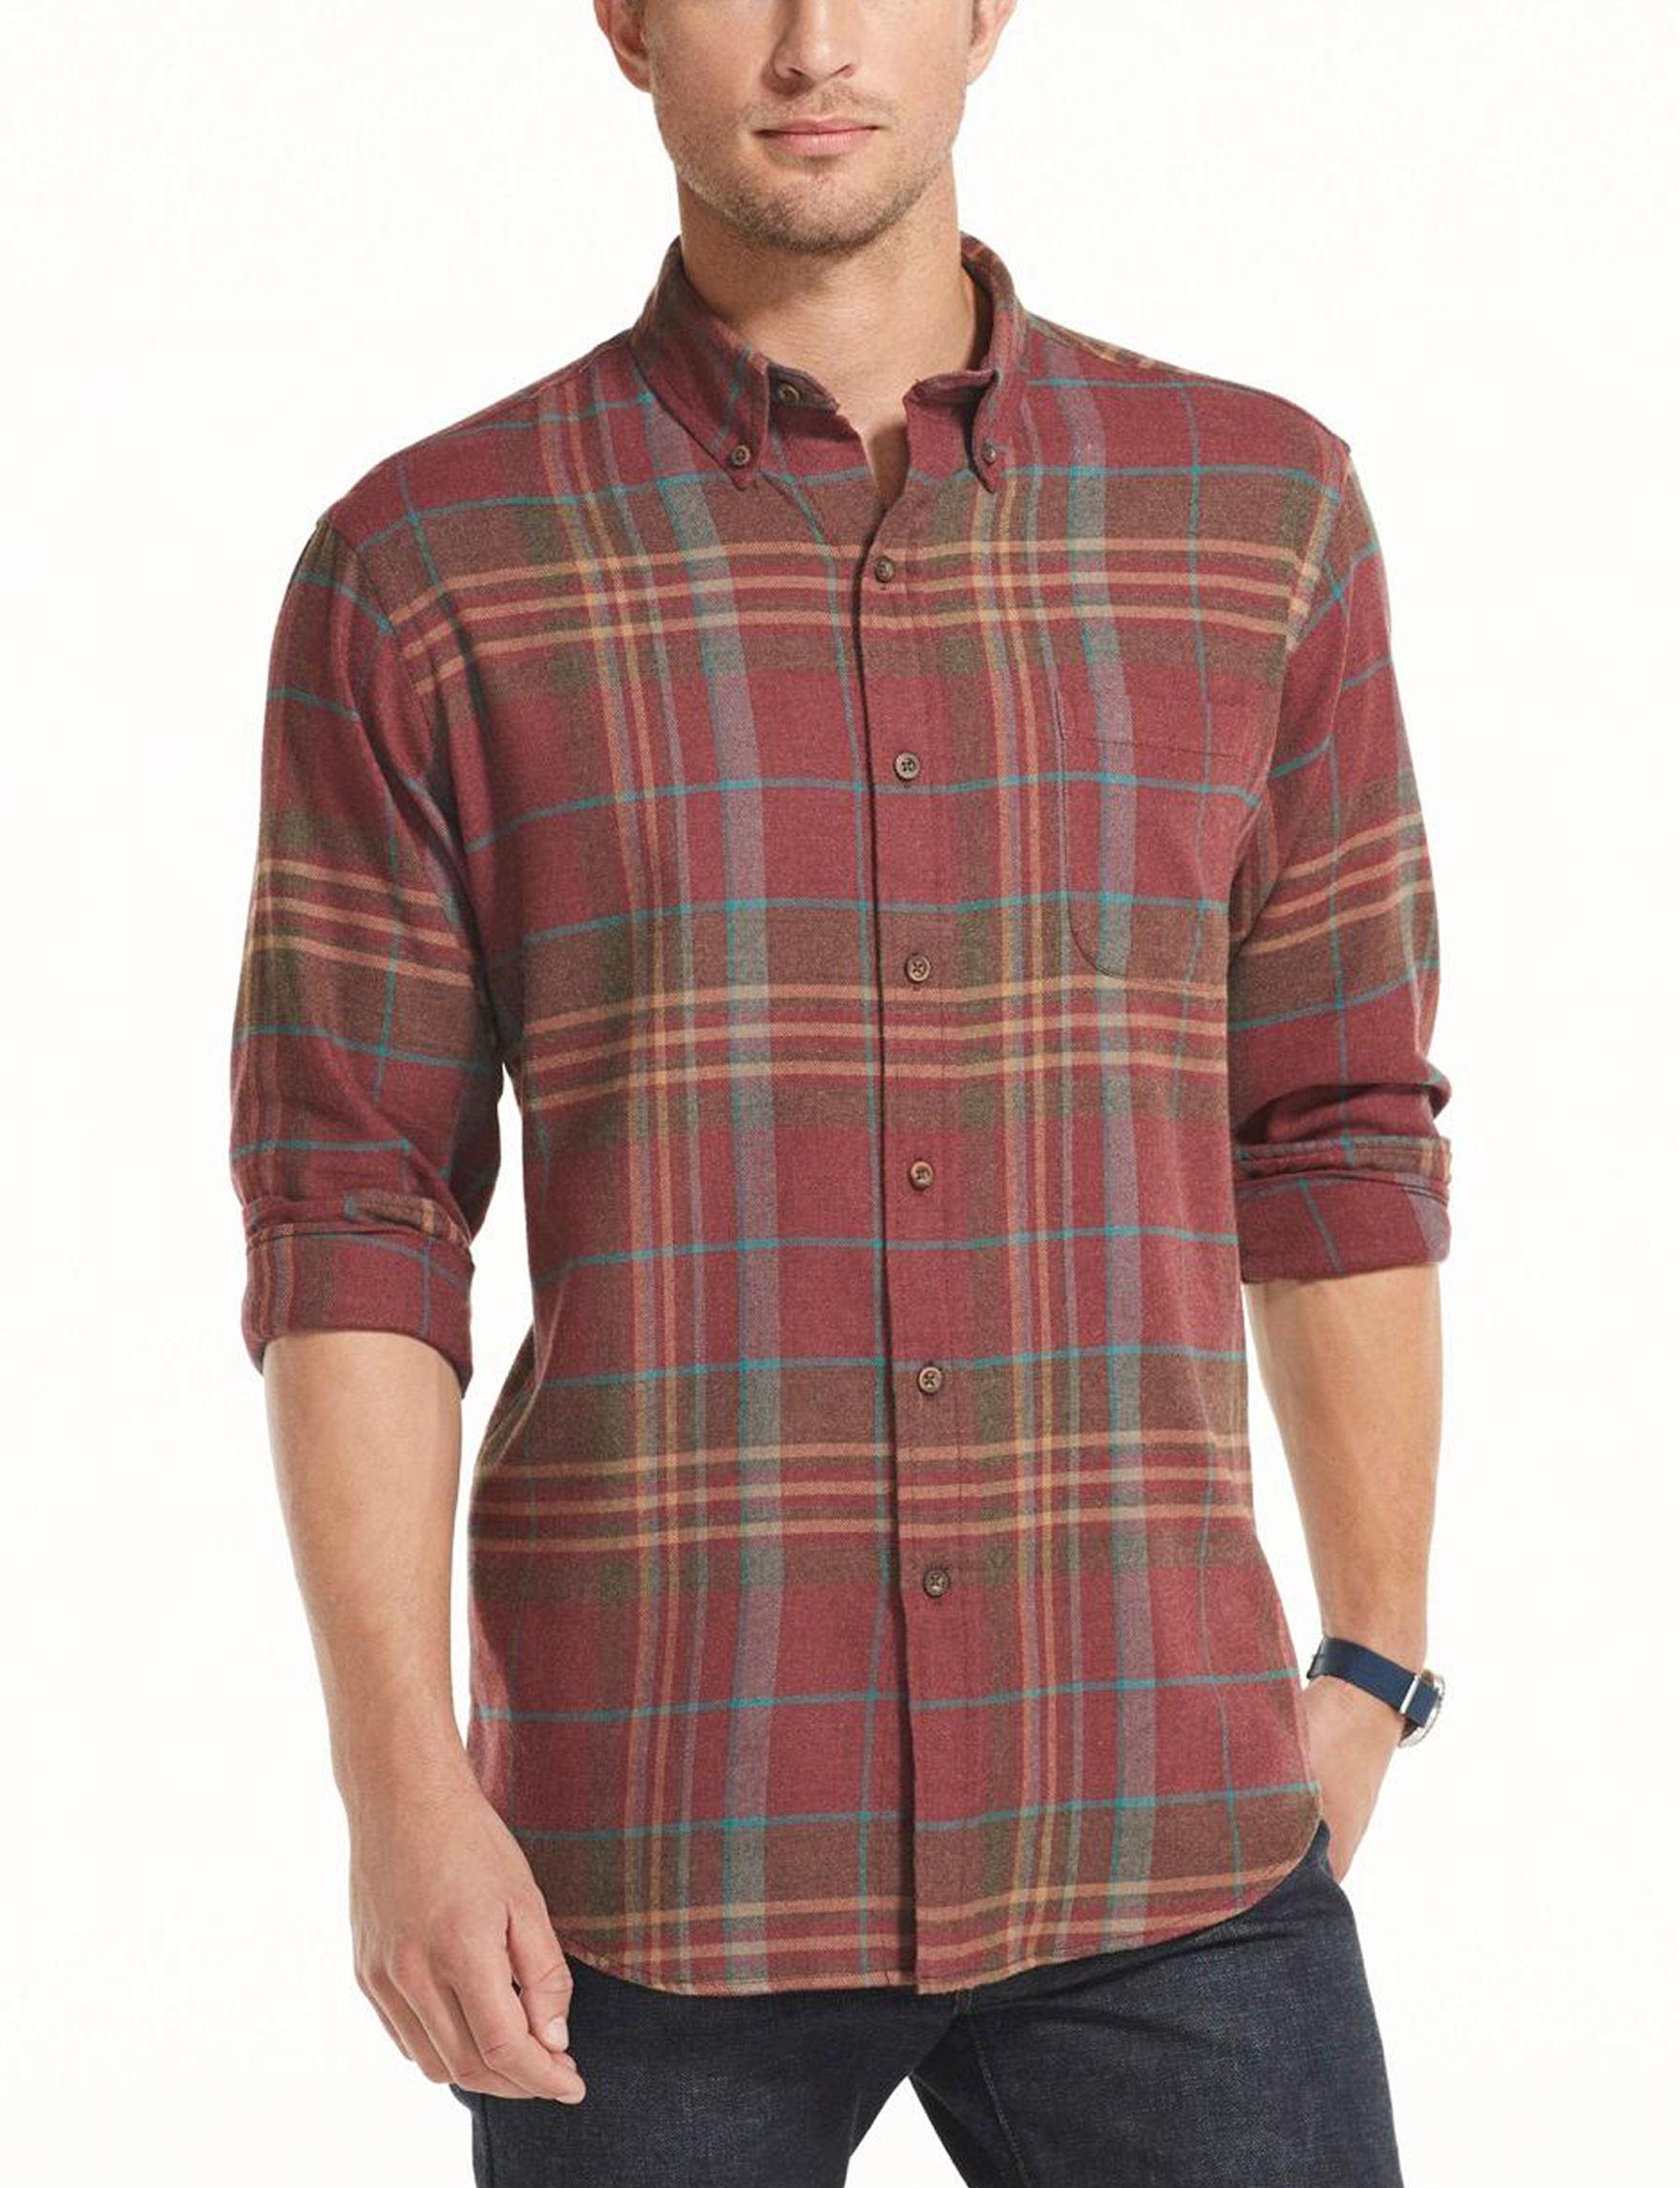 Arrow Madder Brown Casual Button Down Shirts